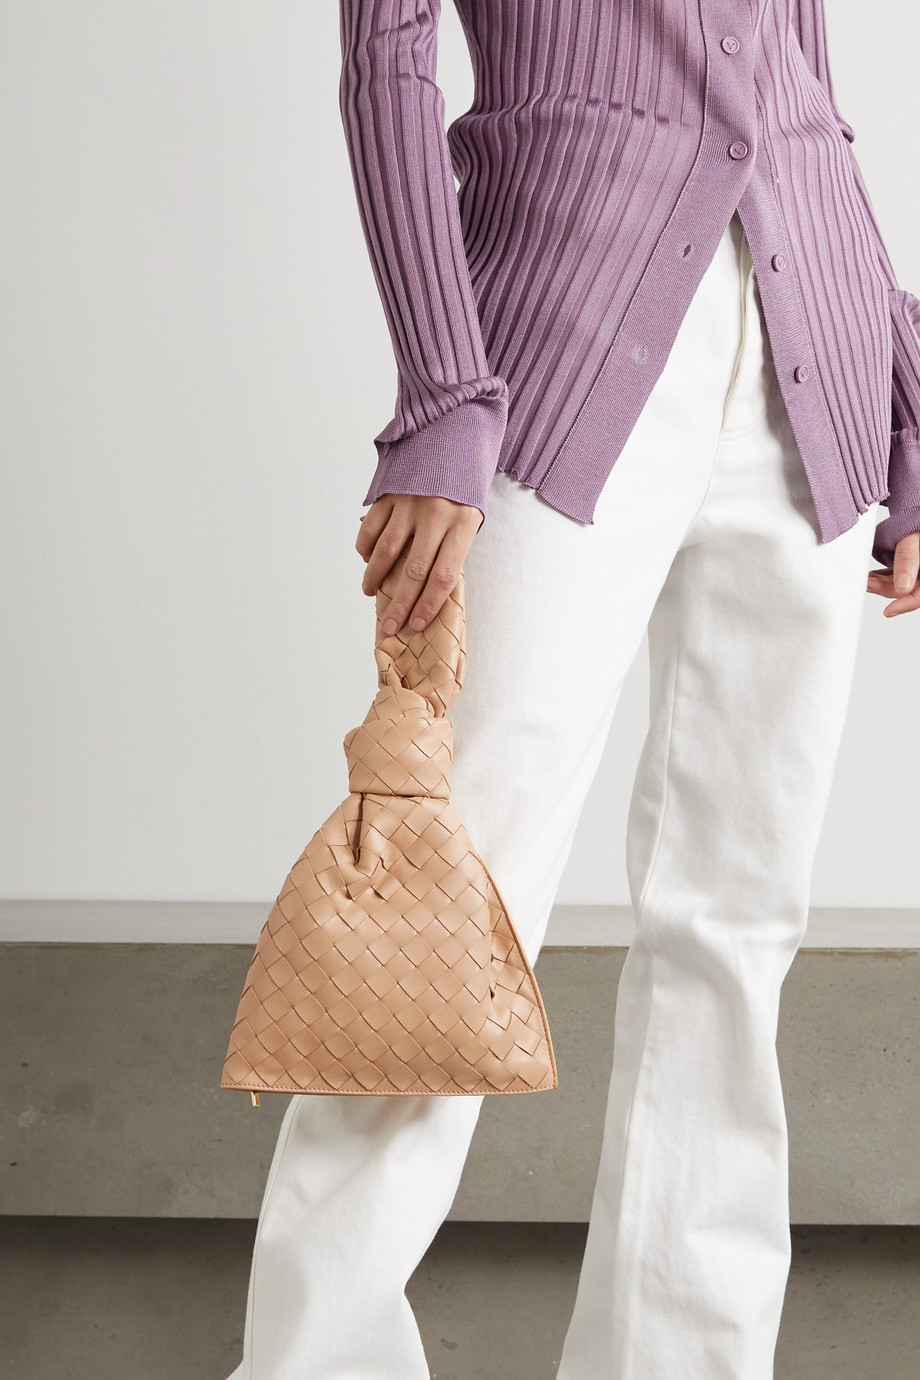 Bottega Veneta Pochette en cuir intrecciato noué The Mini Twist